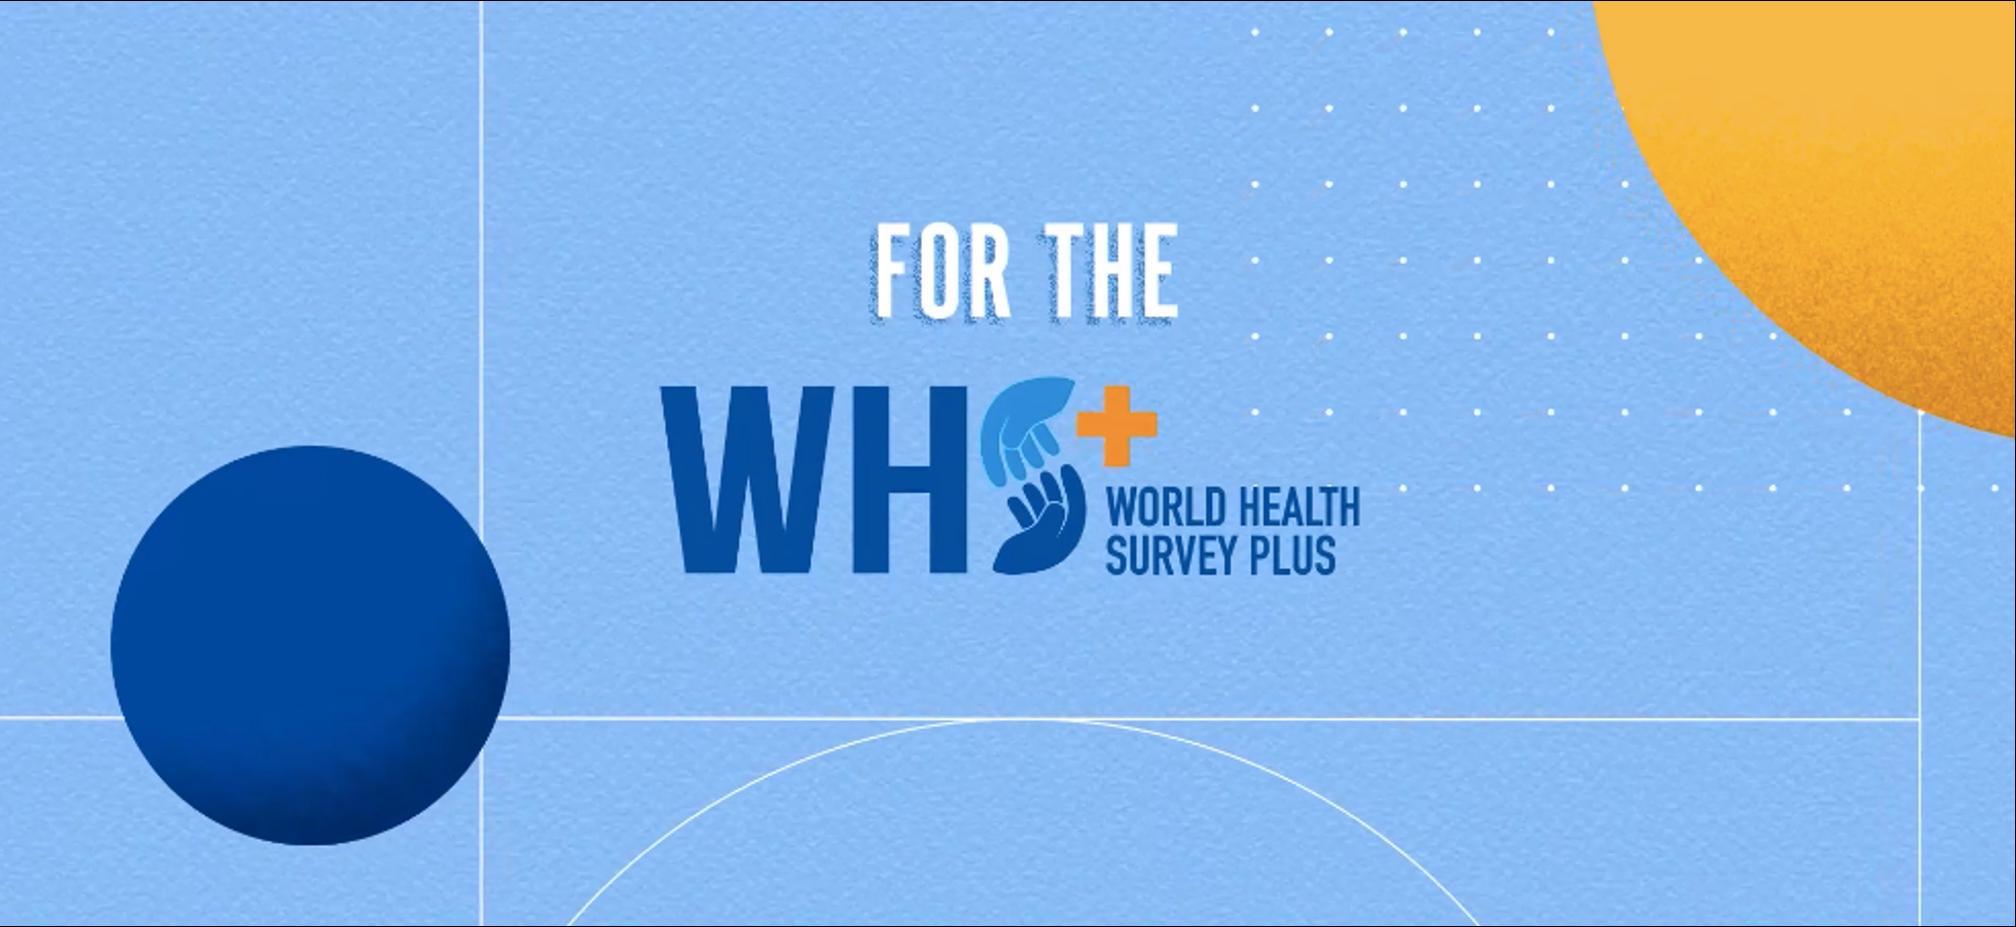 WHS+ Expert Consultation